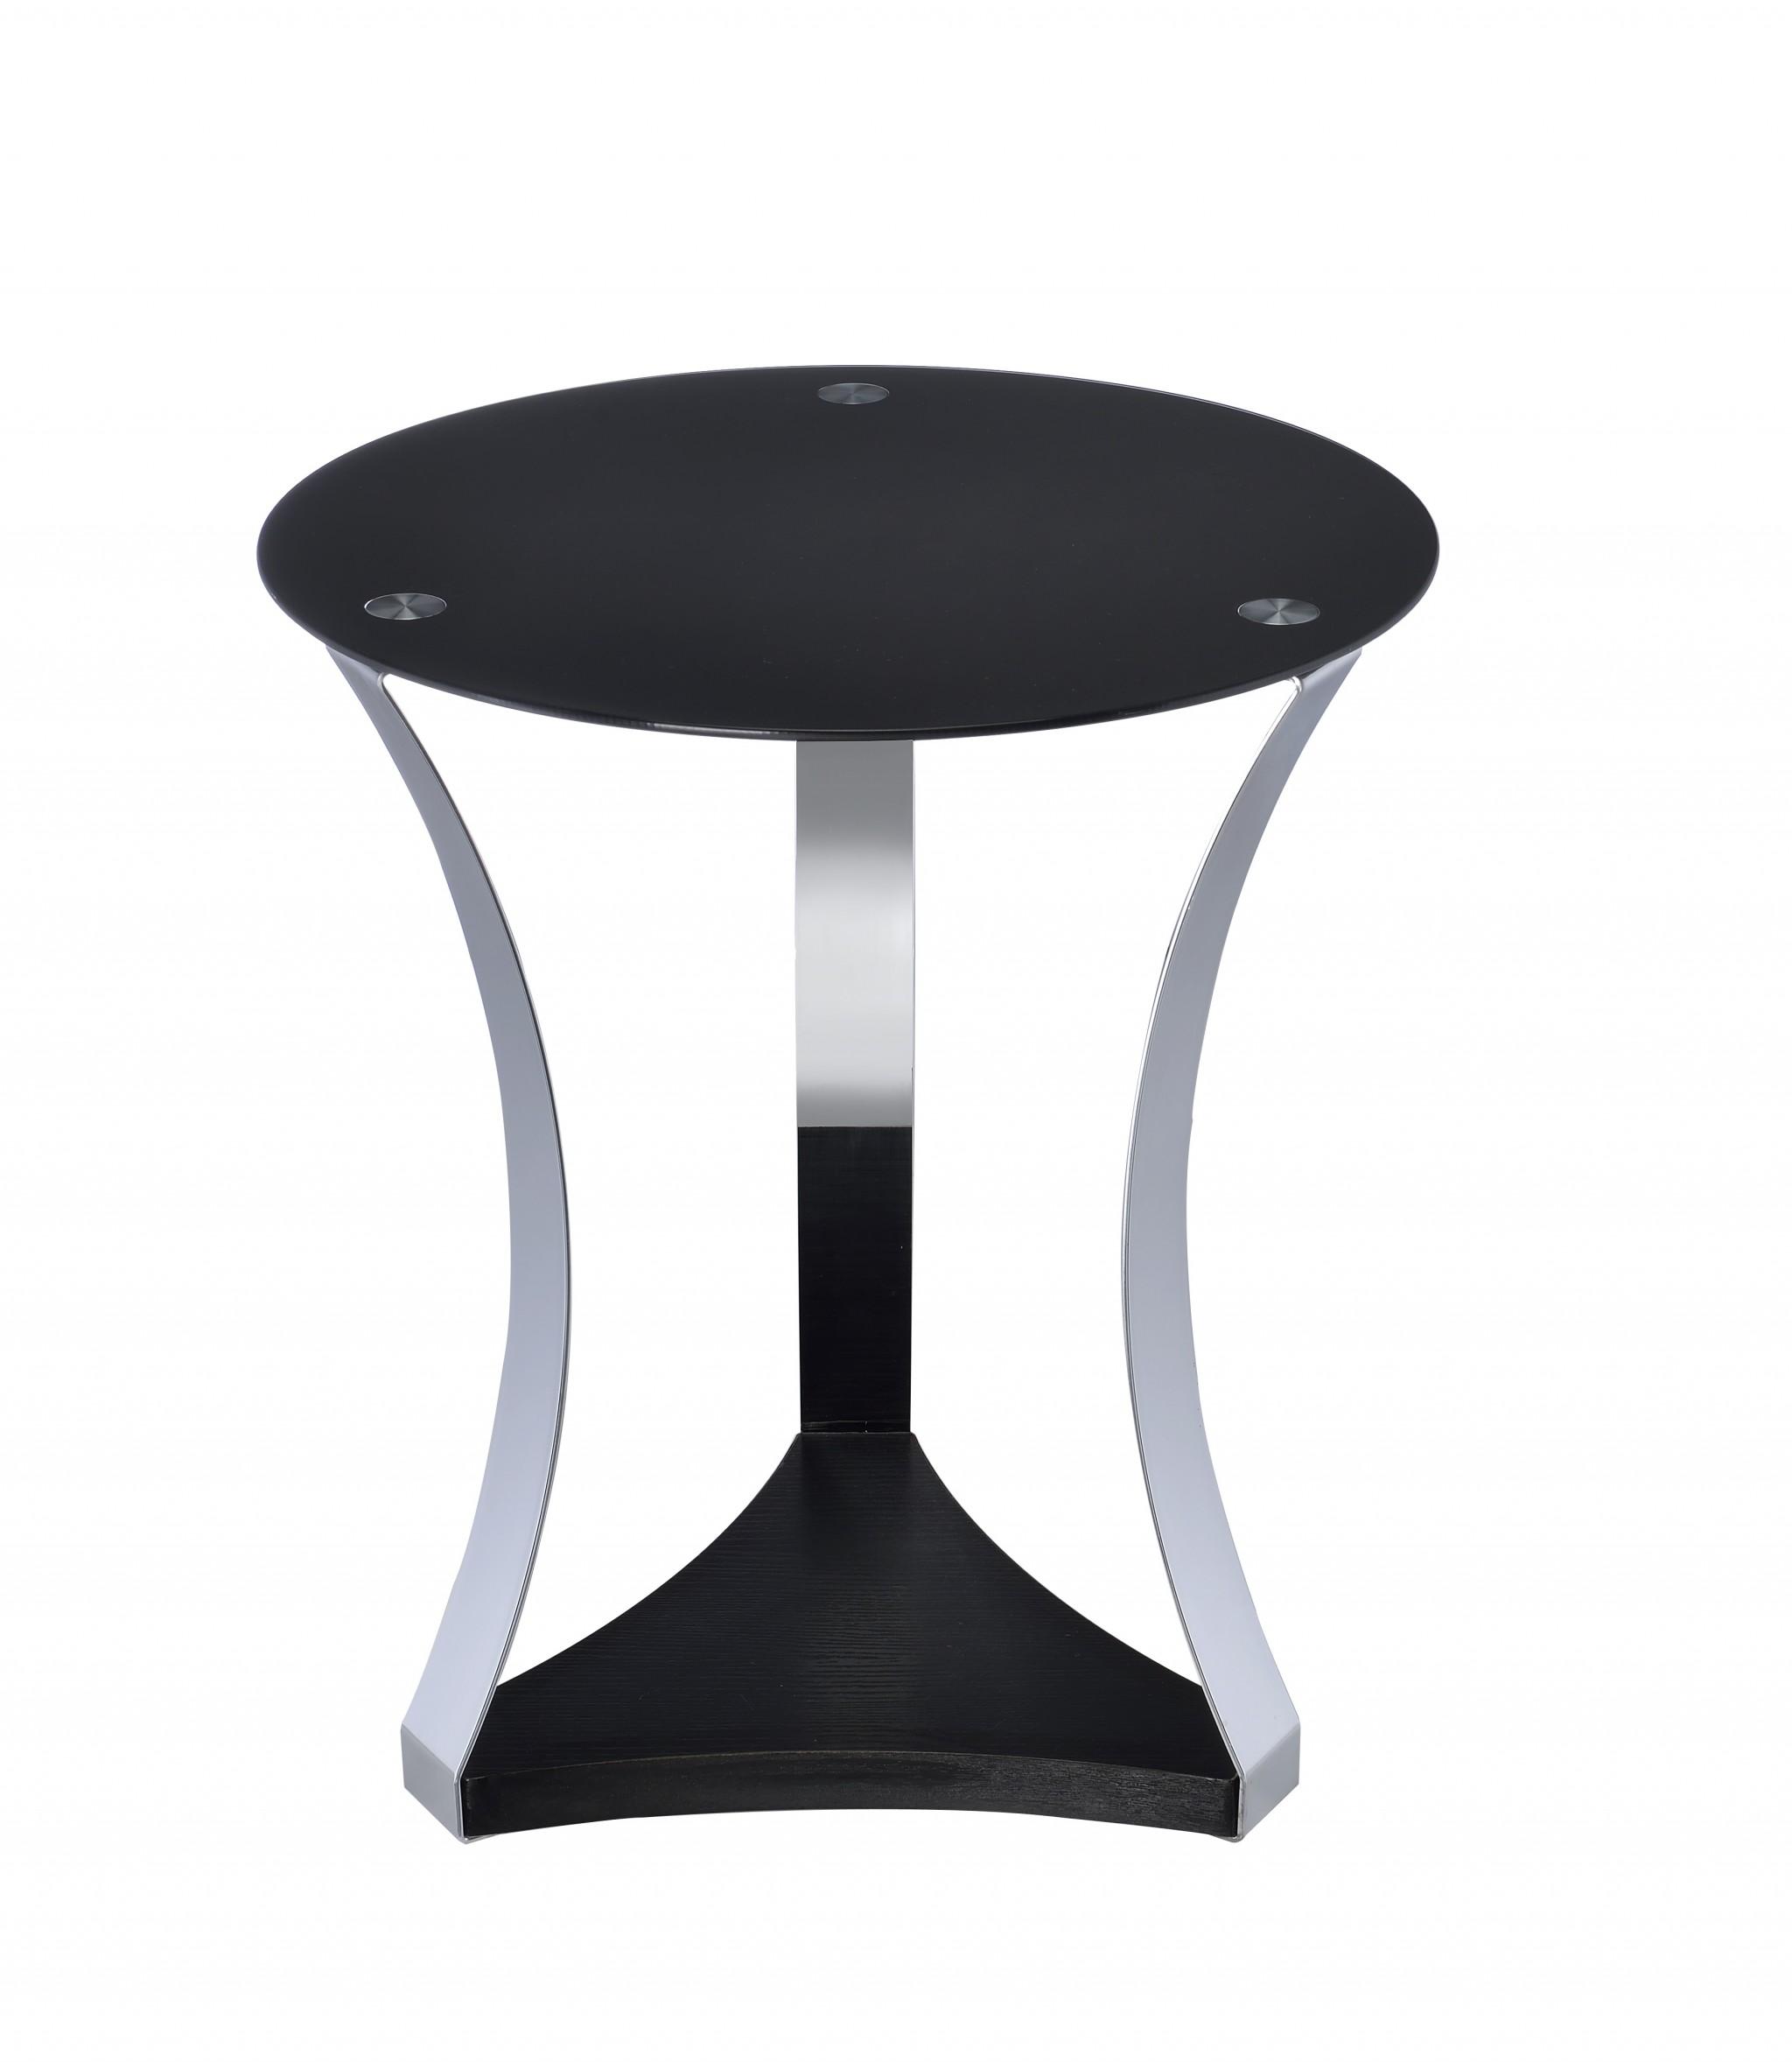 "18"" X 18"" X 20"" Black Glass & Chrome End Table"